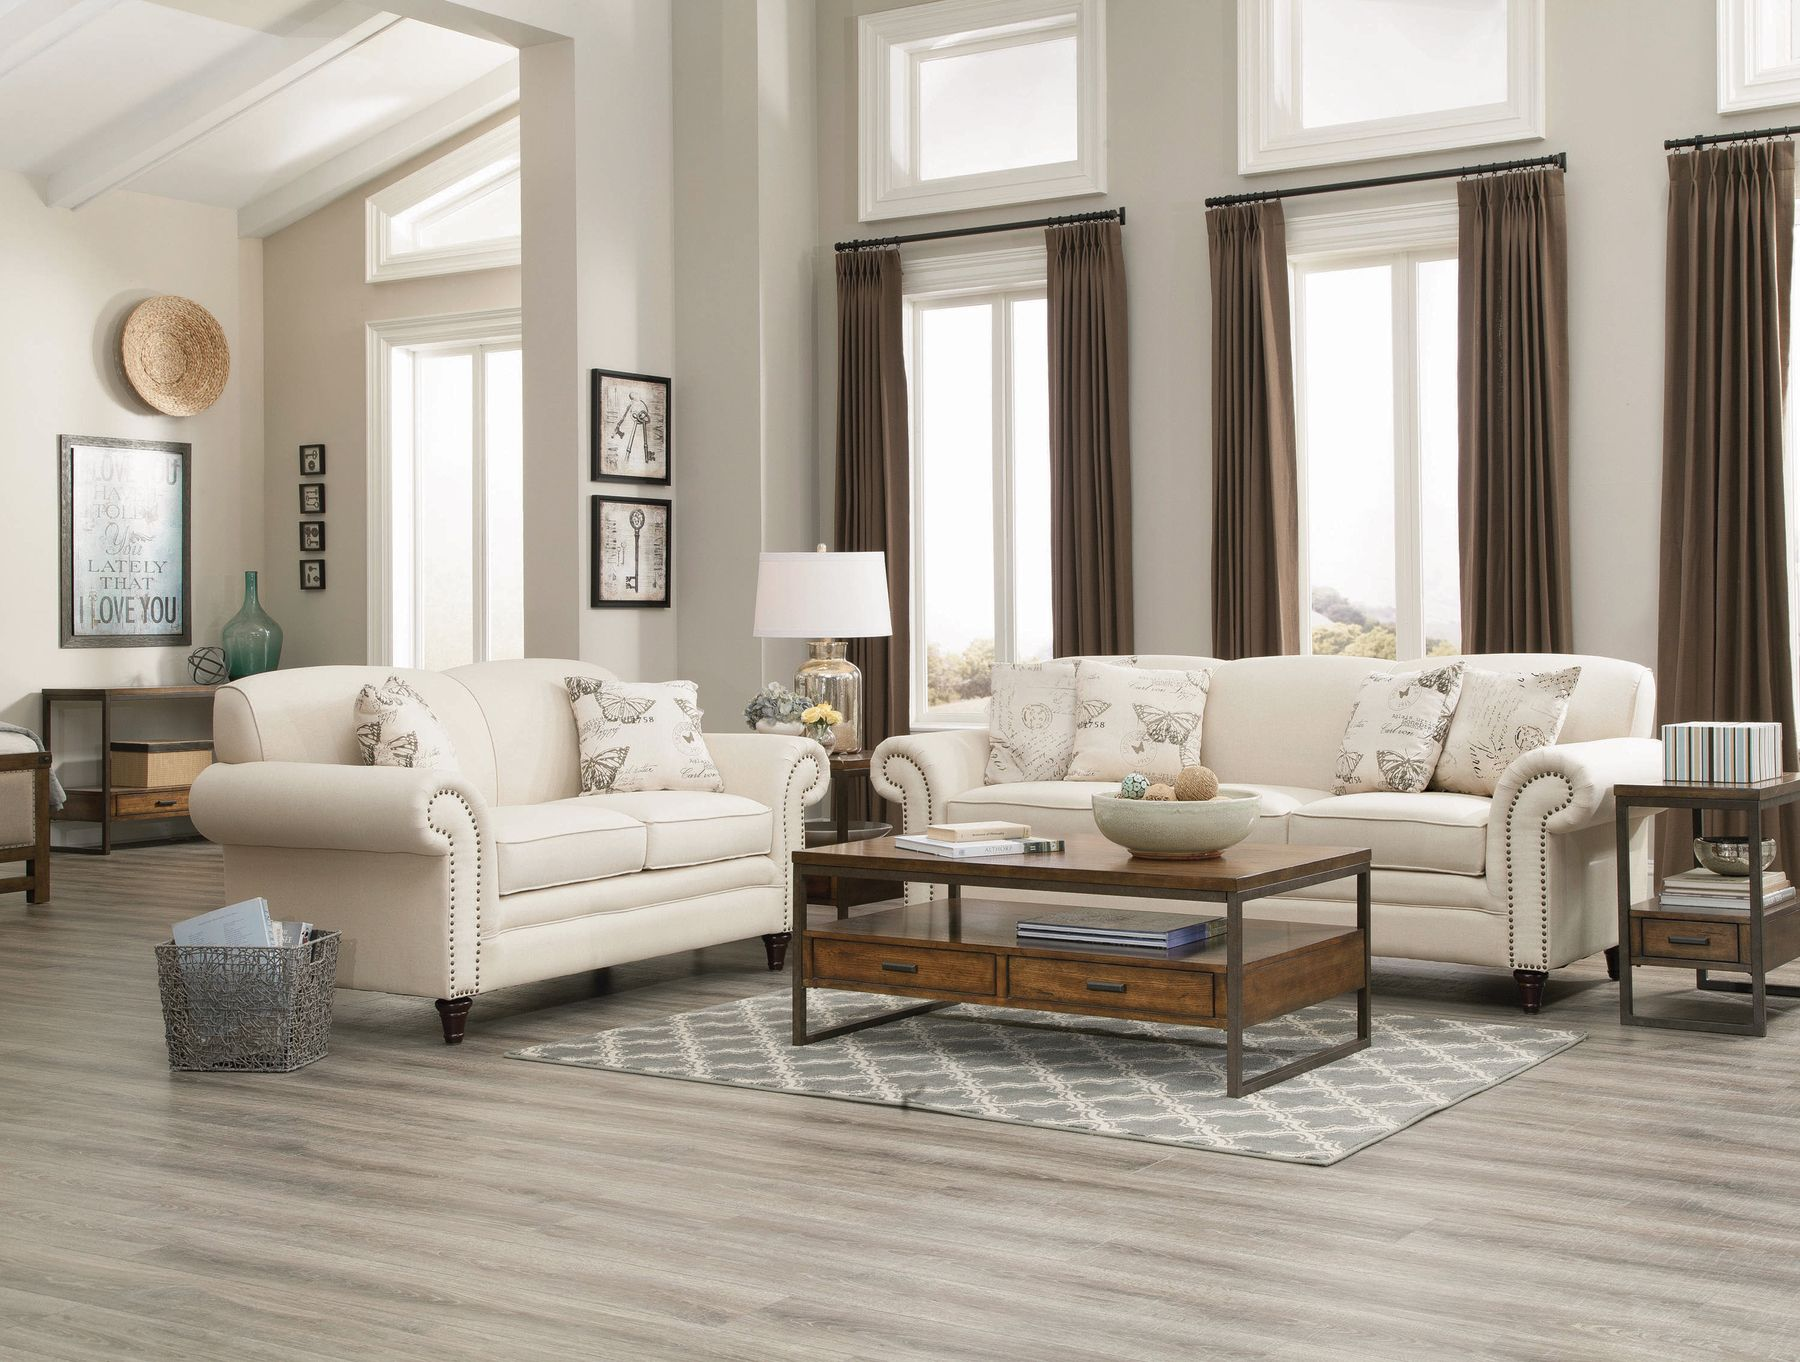 49 Fabric Living Room Sets Ideas, White Living Room Set